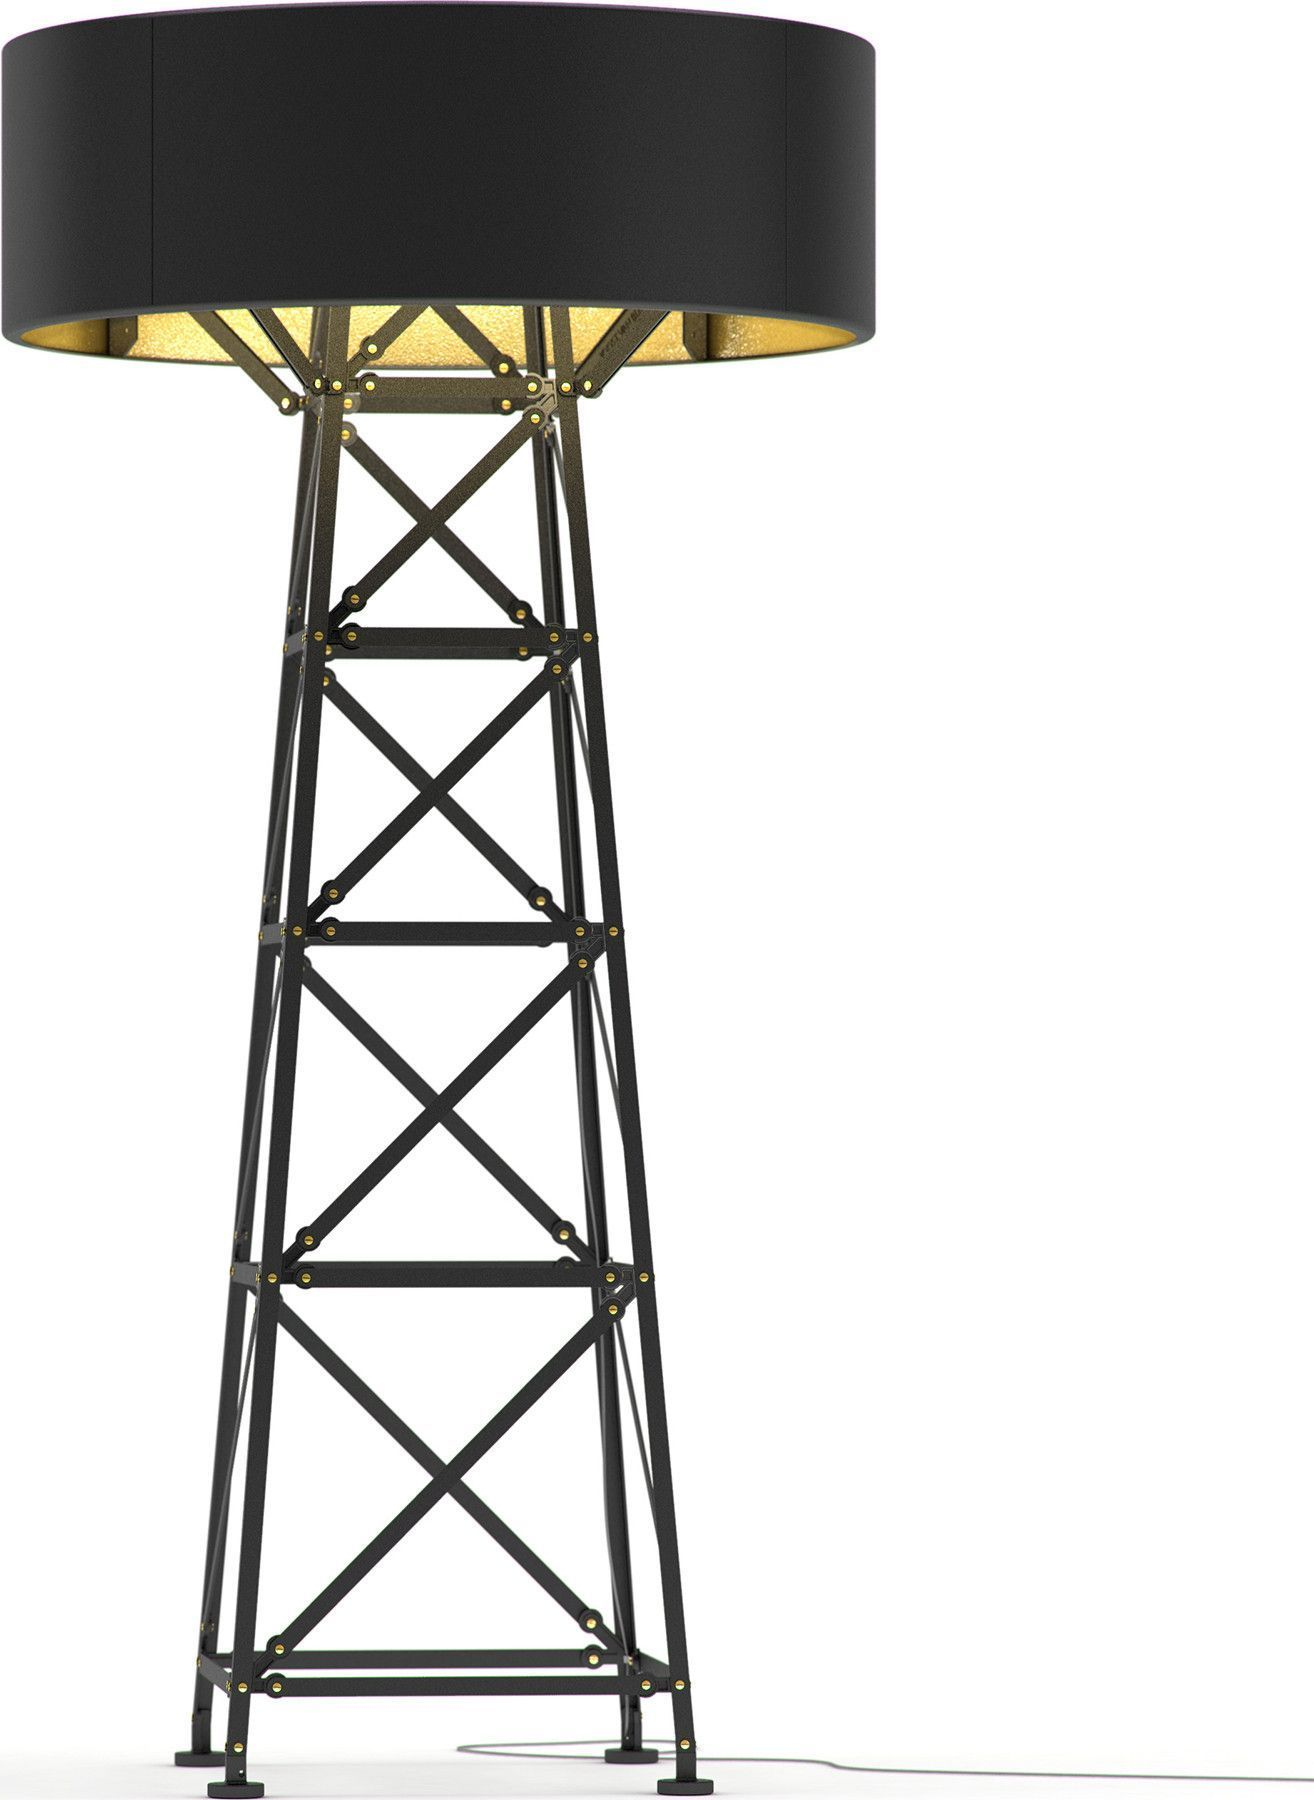 Construction Large Lamp Construction Large Lamp